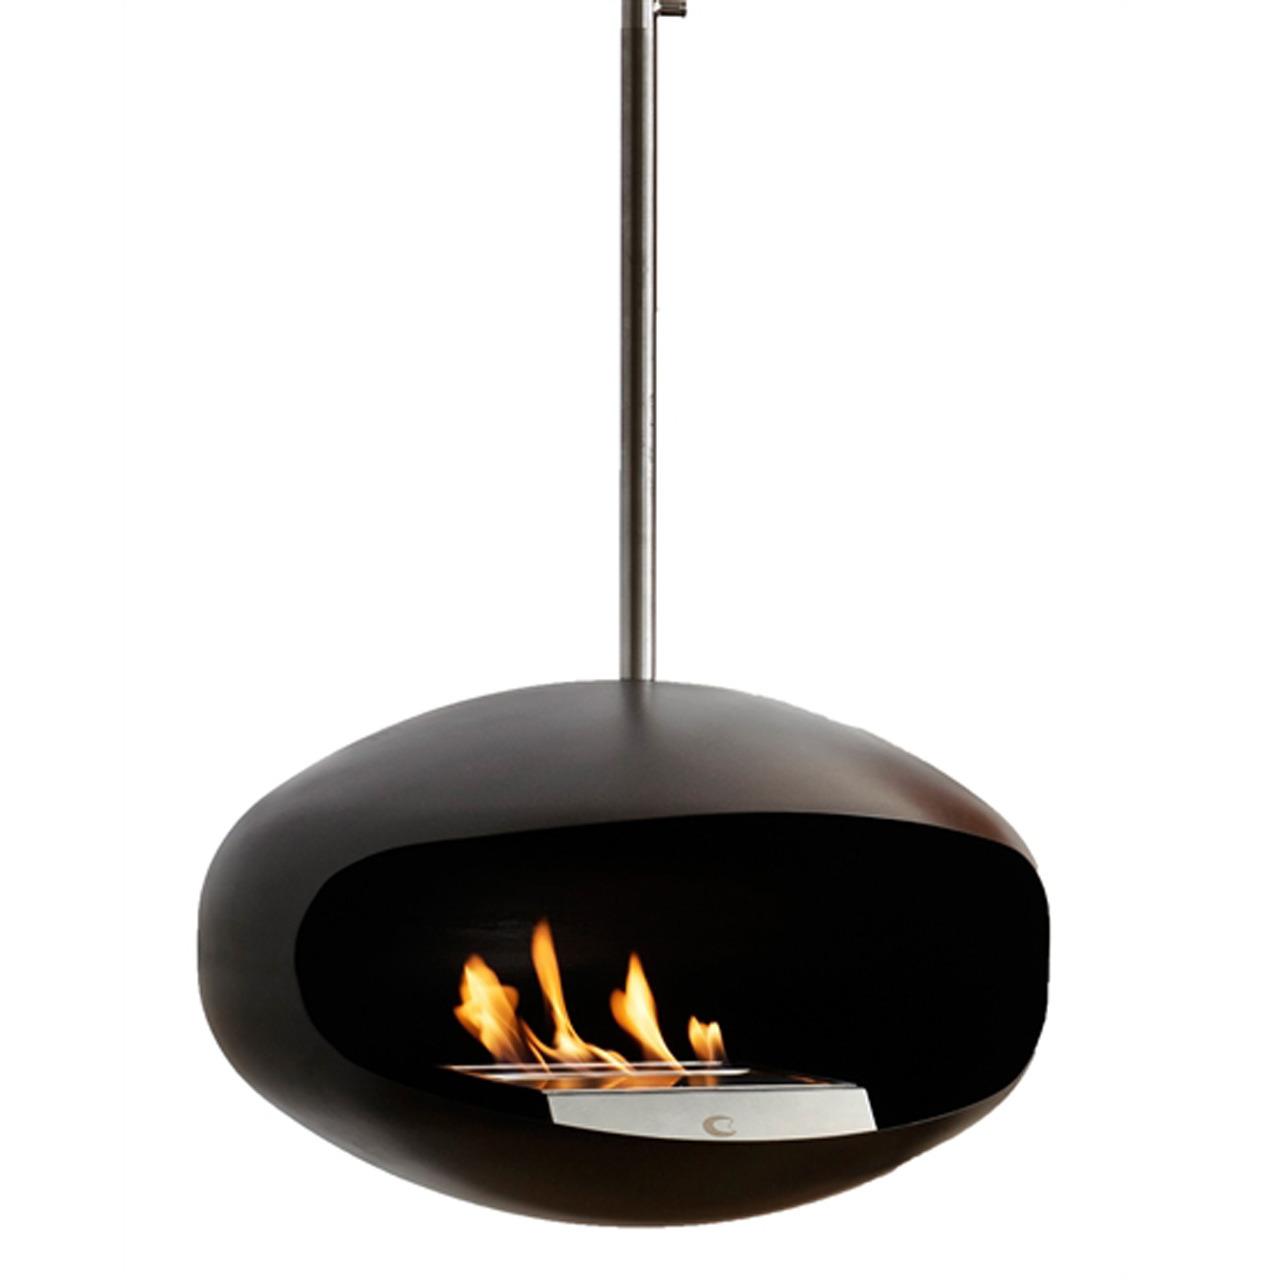 Feuerstelle Cocoon Fire Cocoon Aeris Black